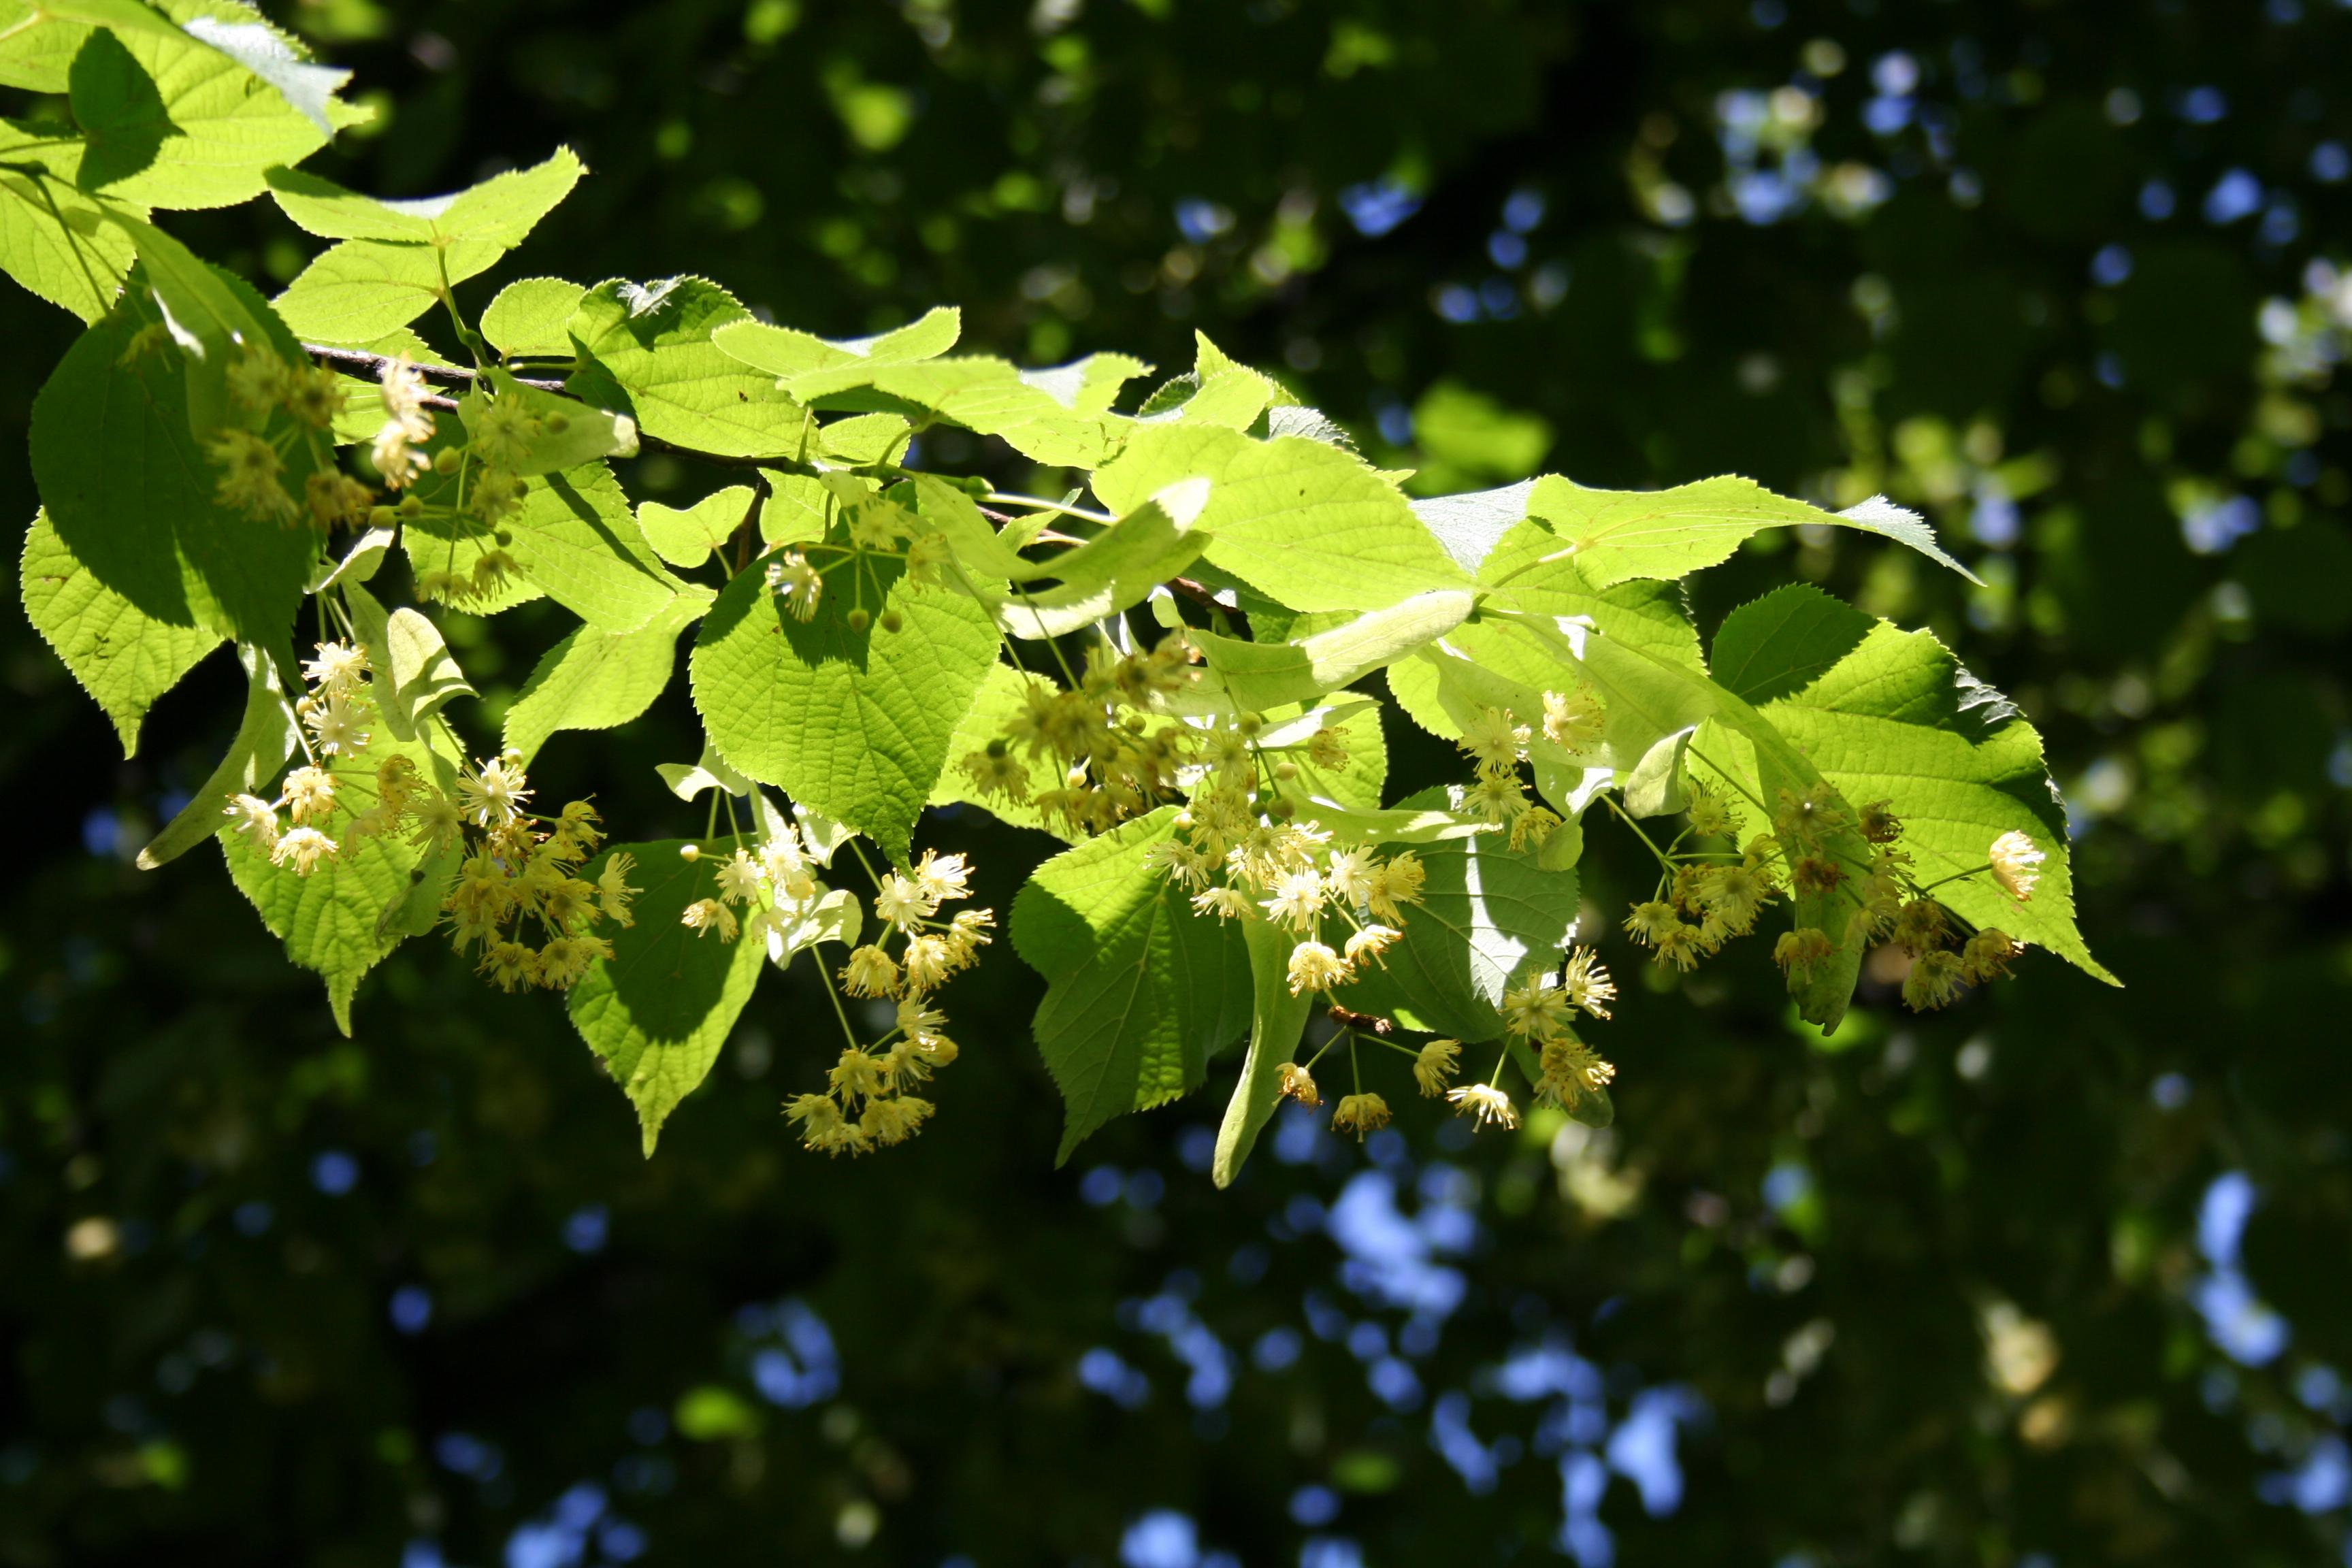 Greenspire Linden (Tilia cordata \'Greenspire\') - Revolutionary Gardens